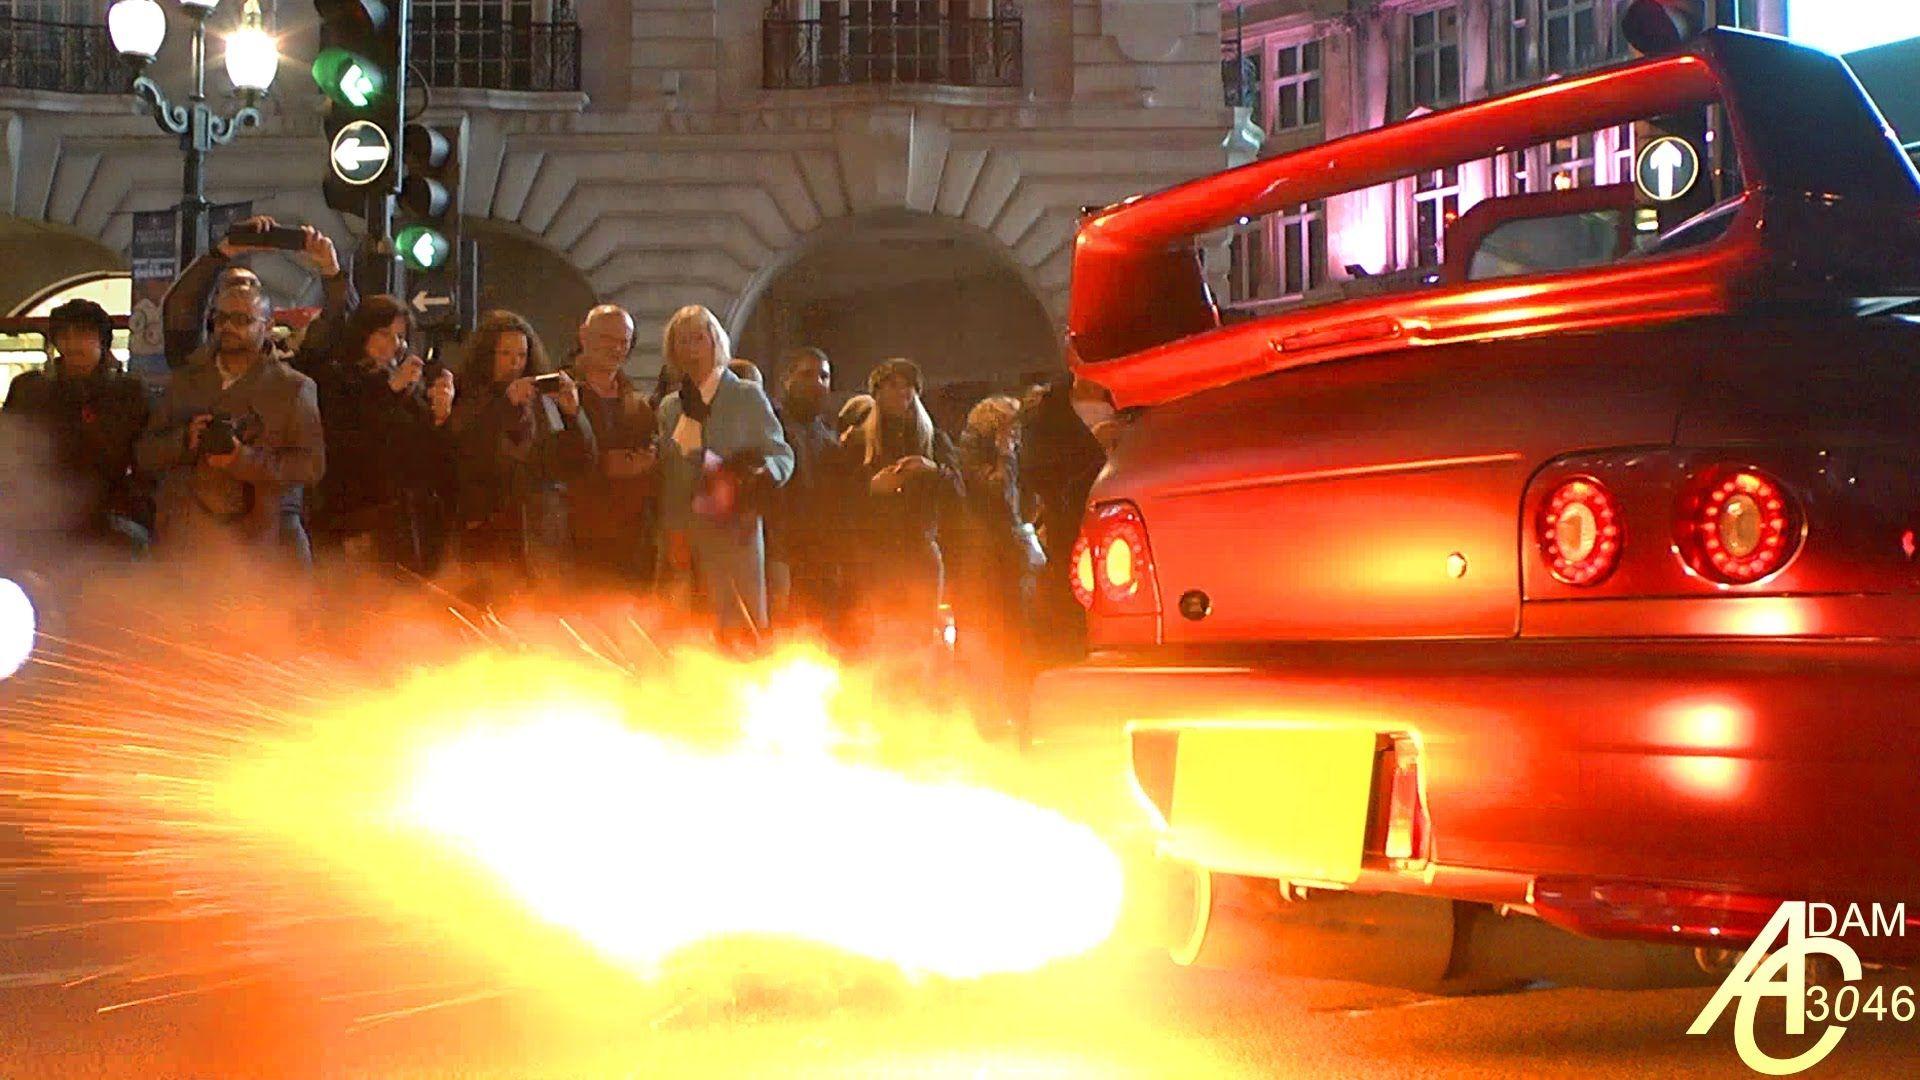 INSANE FLAMES shot by Subaru Impreza!